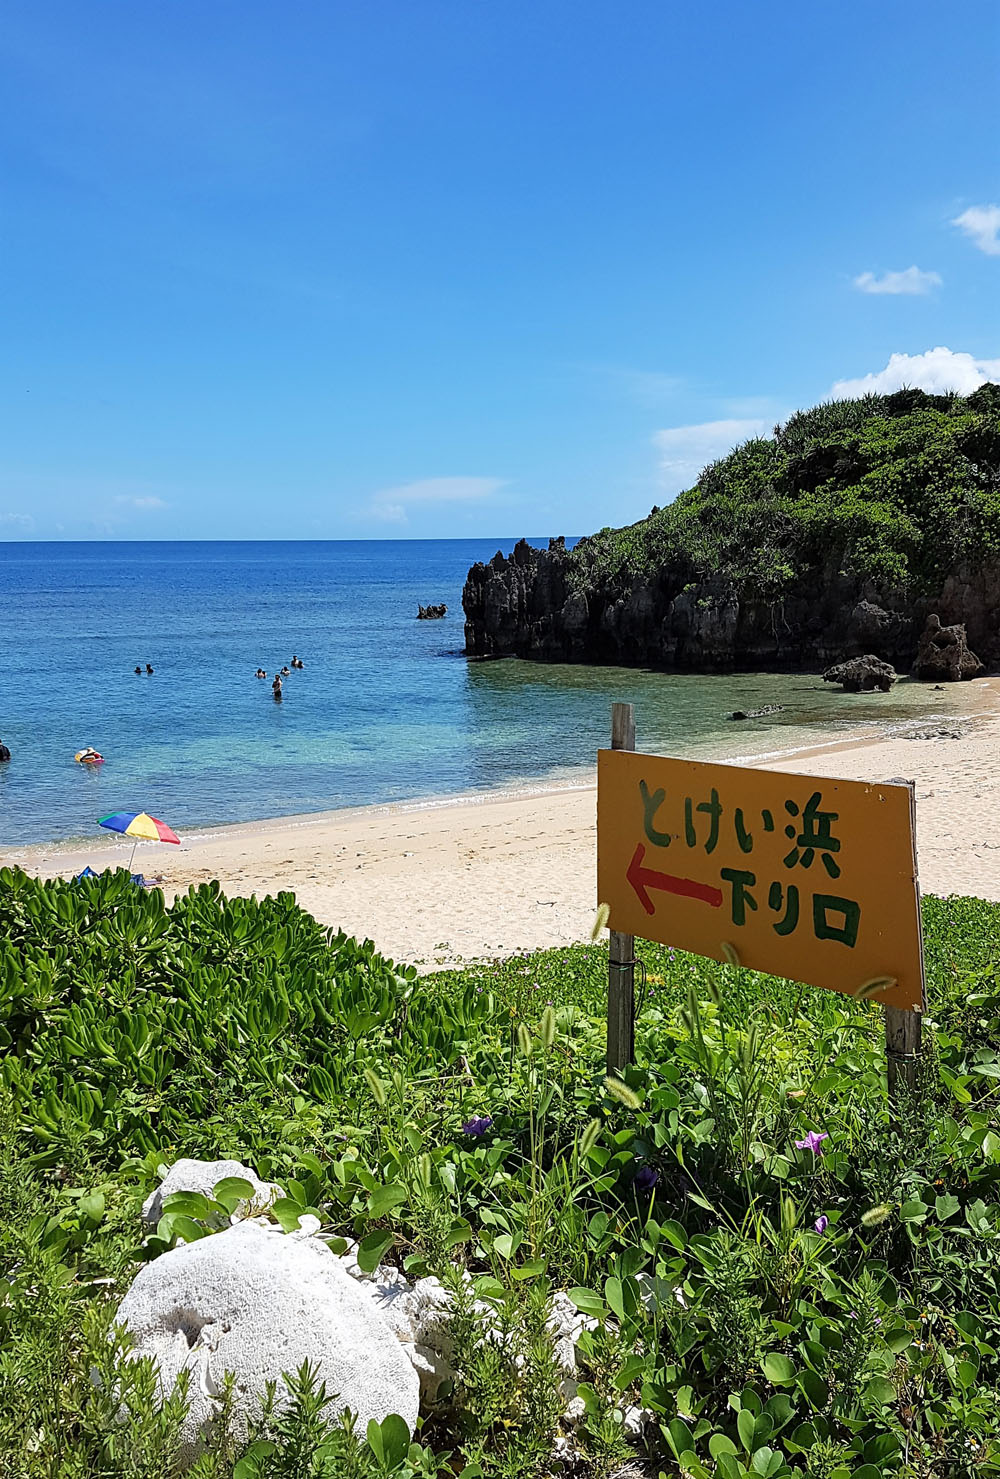 Kouri Island Snorkeling Beach